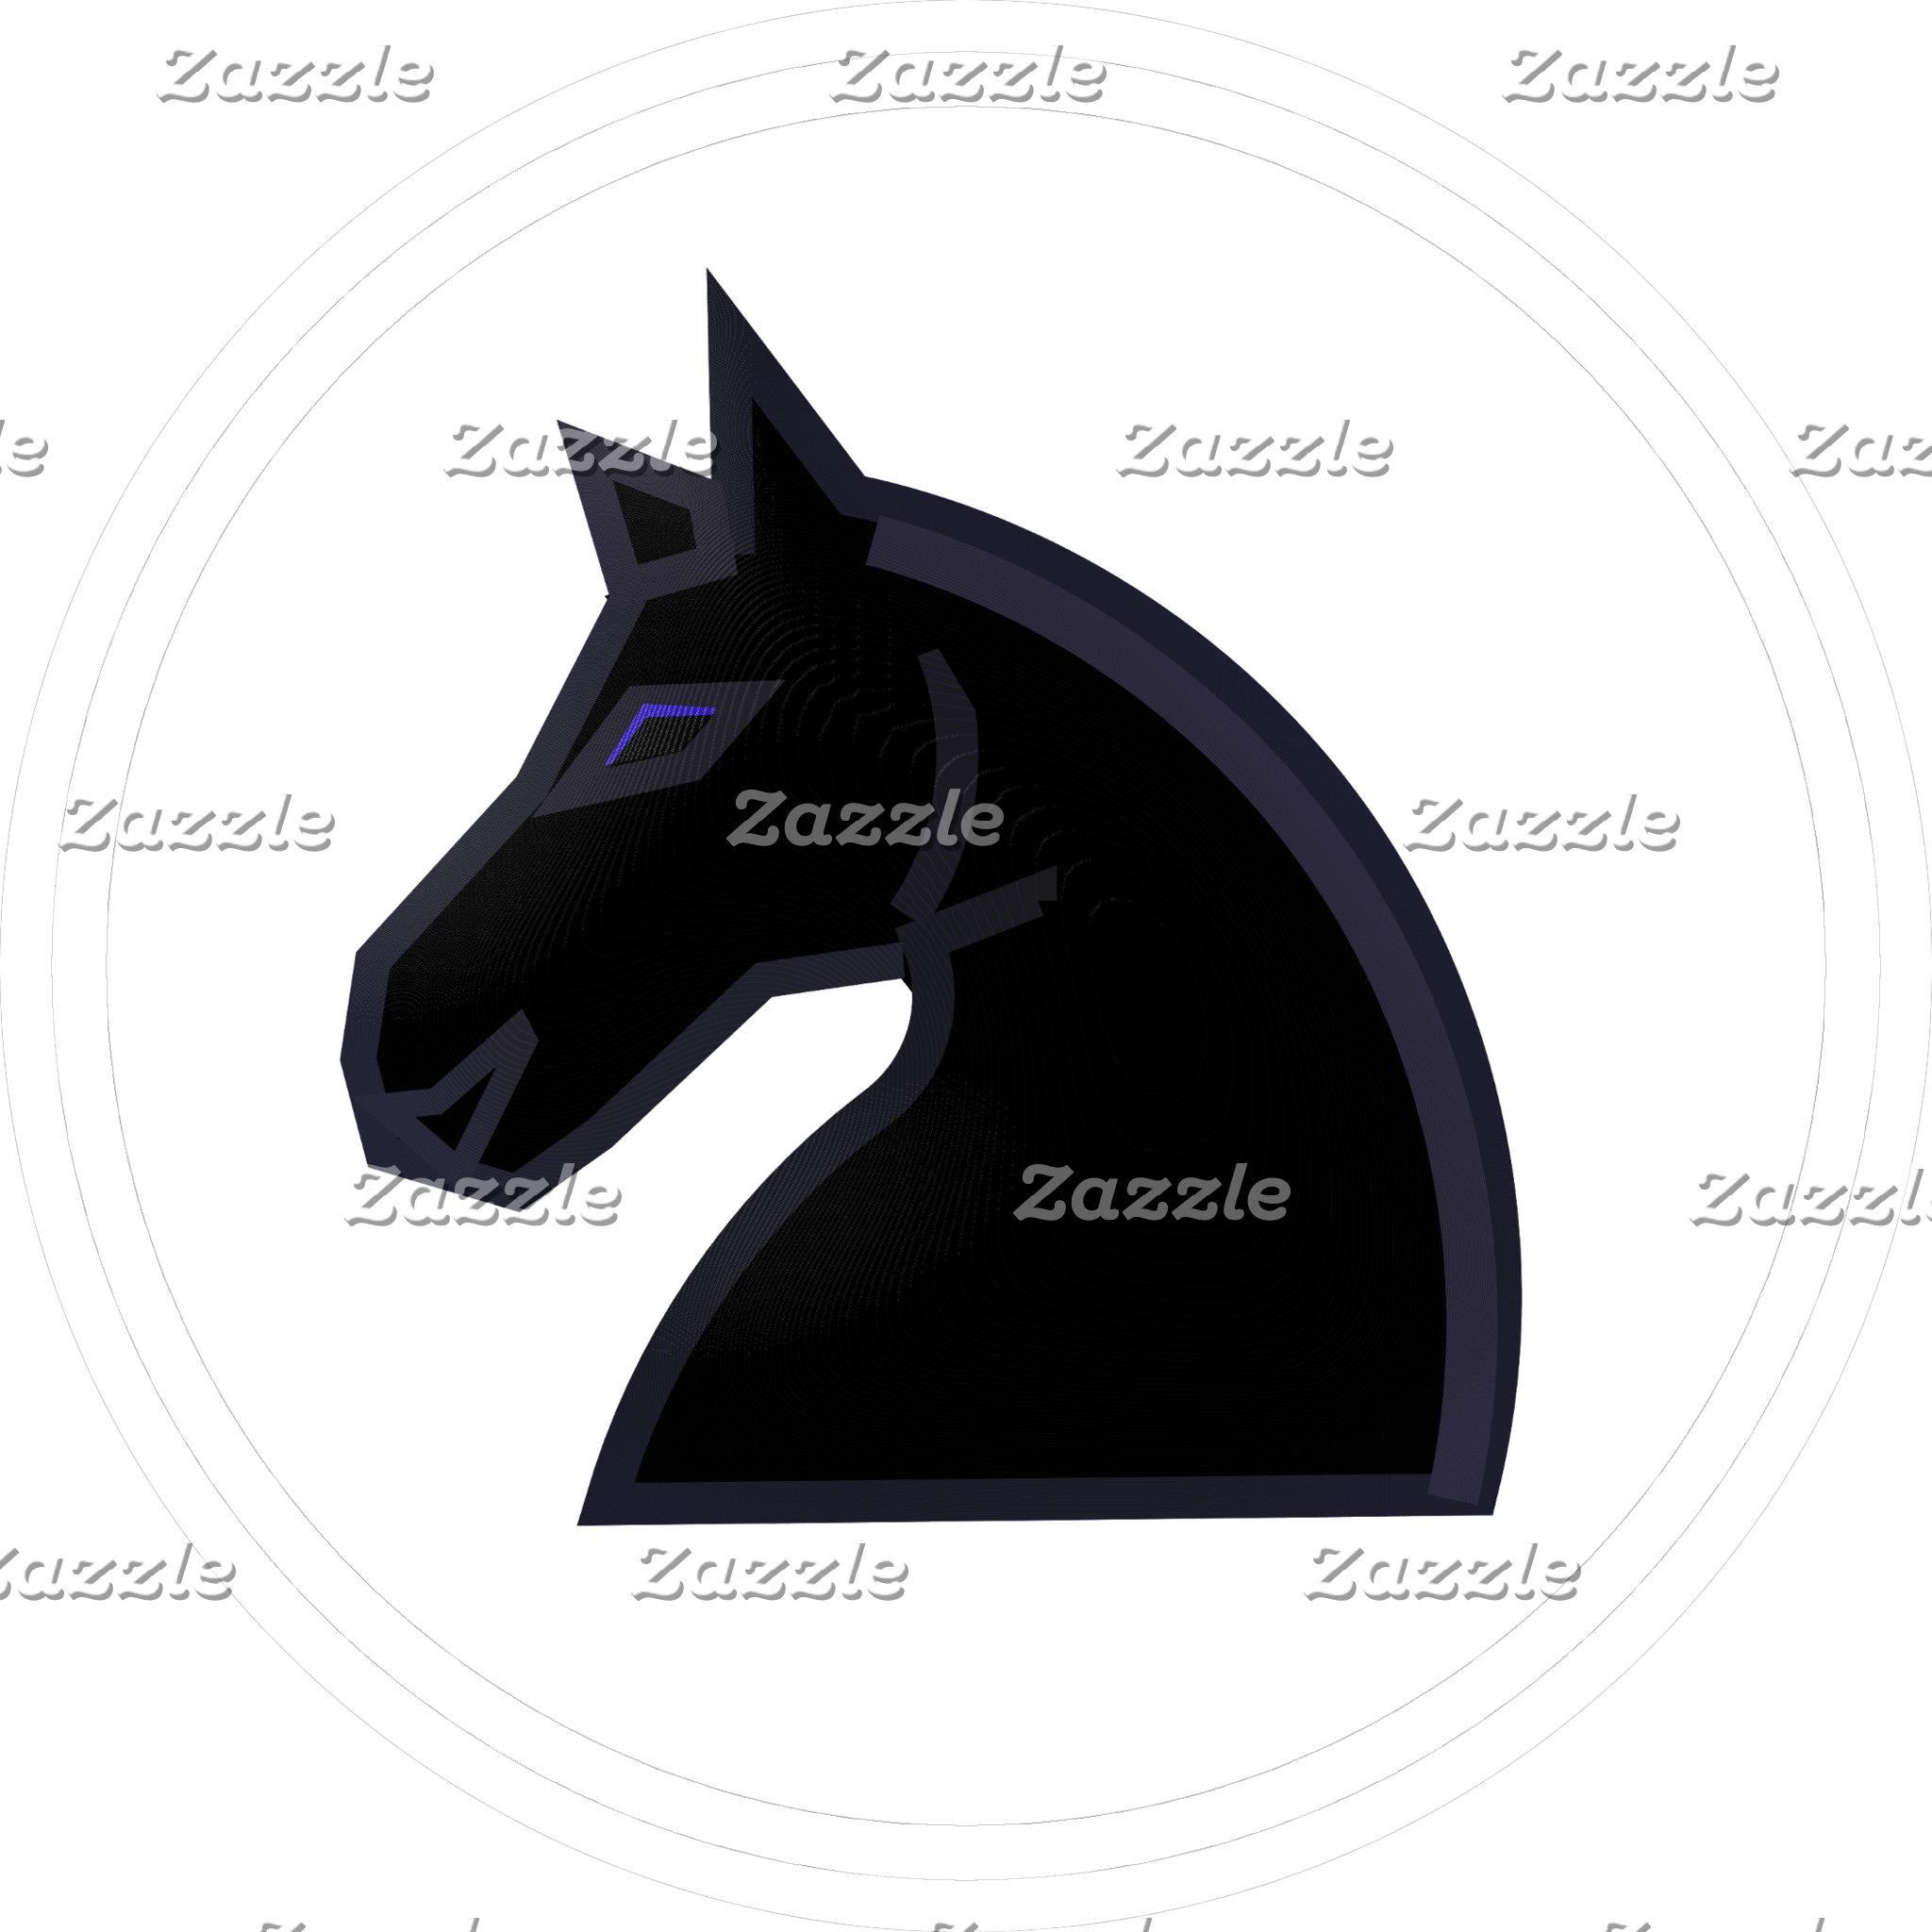 Black Knight Chess Piece